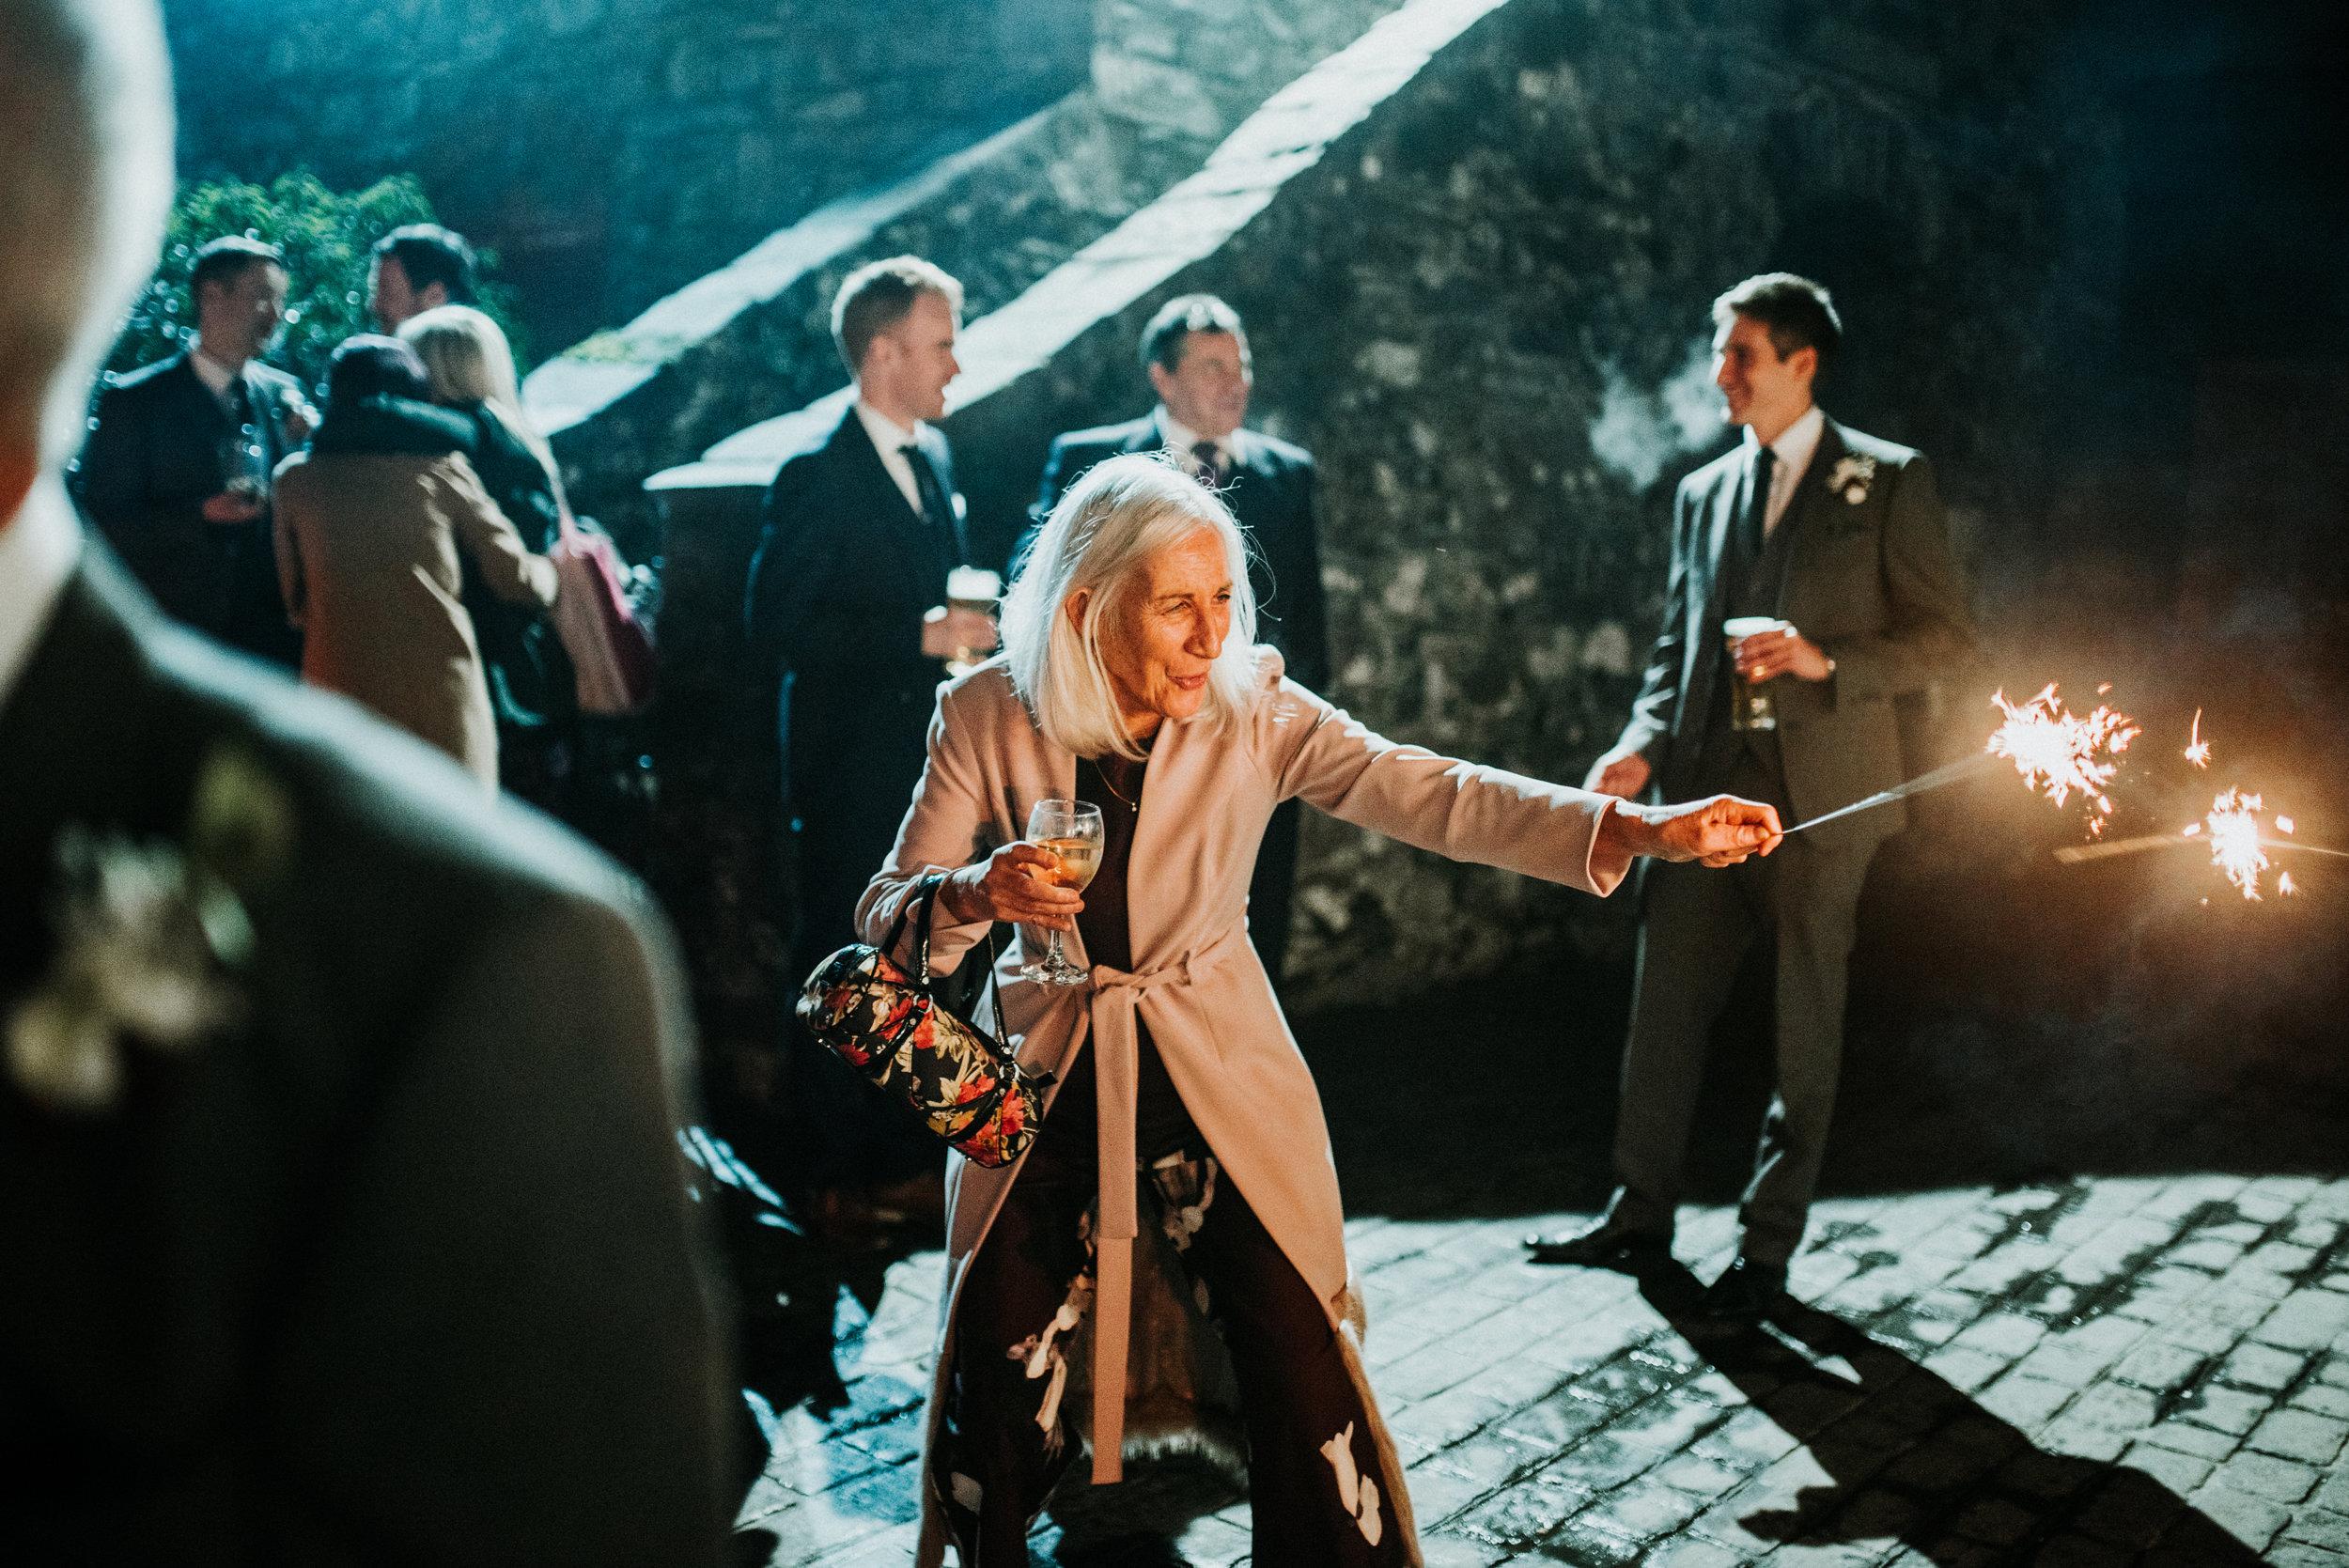 larchfield estate wedding, wedding venues northern ireland, barn wedding venues northern ireland, wedding photos larchfield estate, shane todd wedding, wedding sparklers, irish wedding (5).jpg